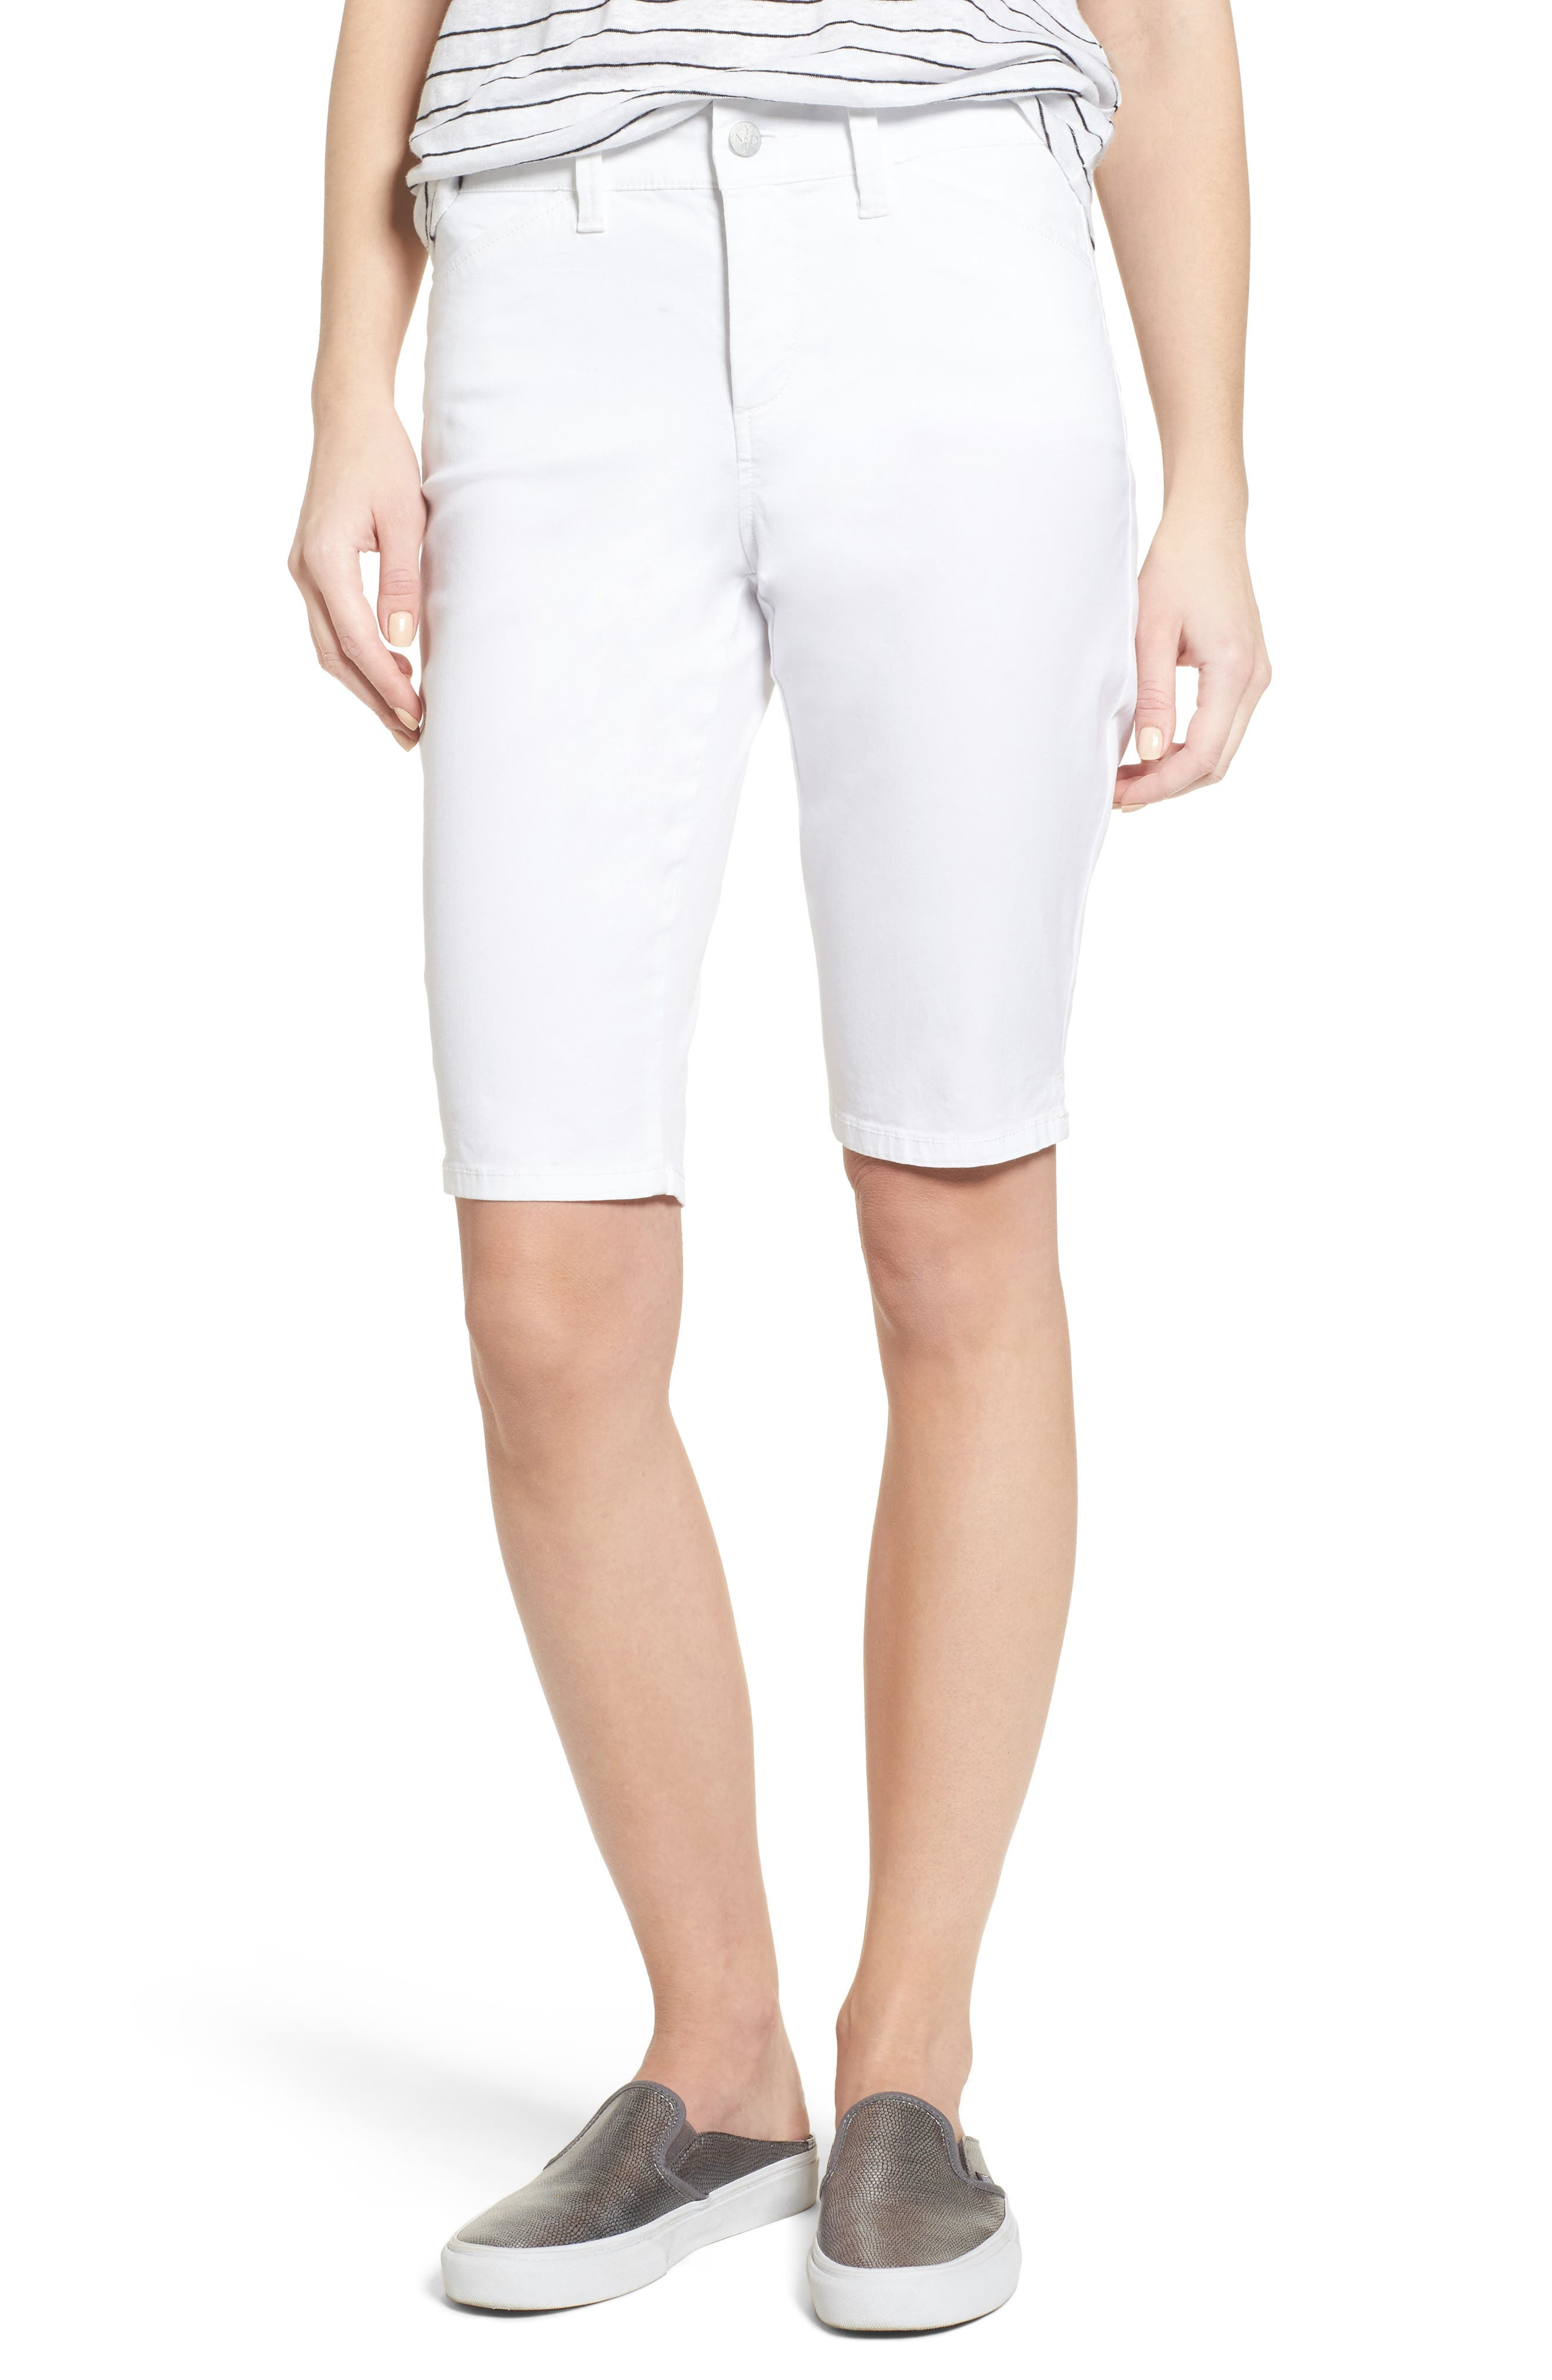 Alternate Image 1 Selected - NYDJ Stretch Twill Bermuda Shorts (Regular & Petite)